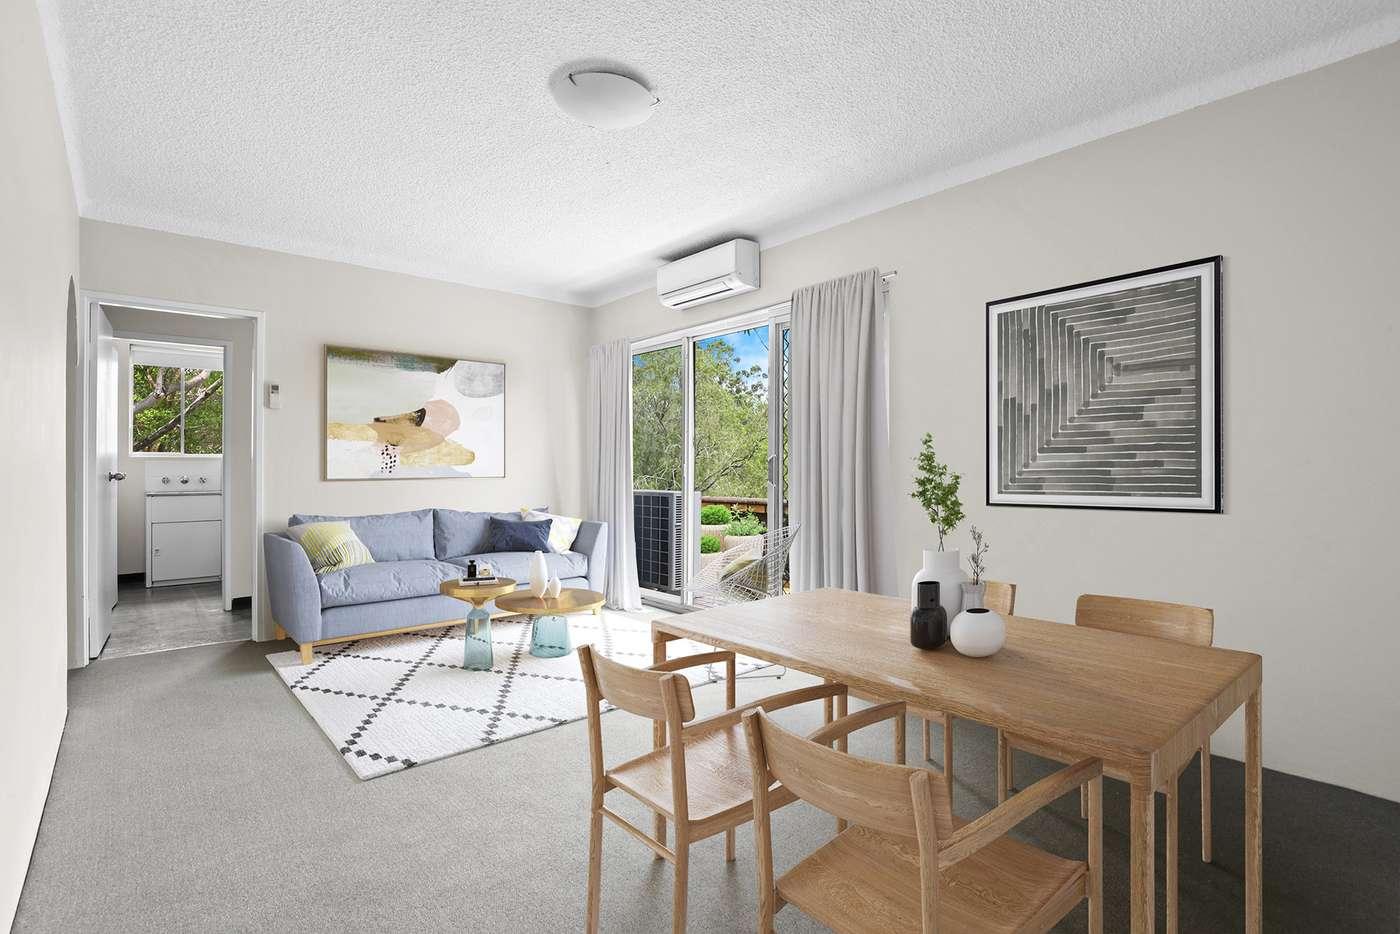 Main view of Homely apartment listing, 7/33 Khartoum Road, Macquarie Park NSW 2113